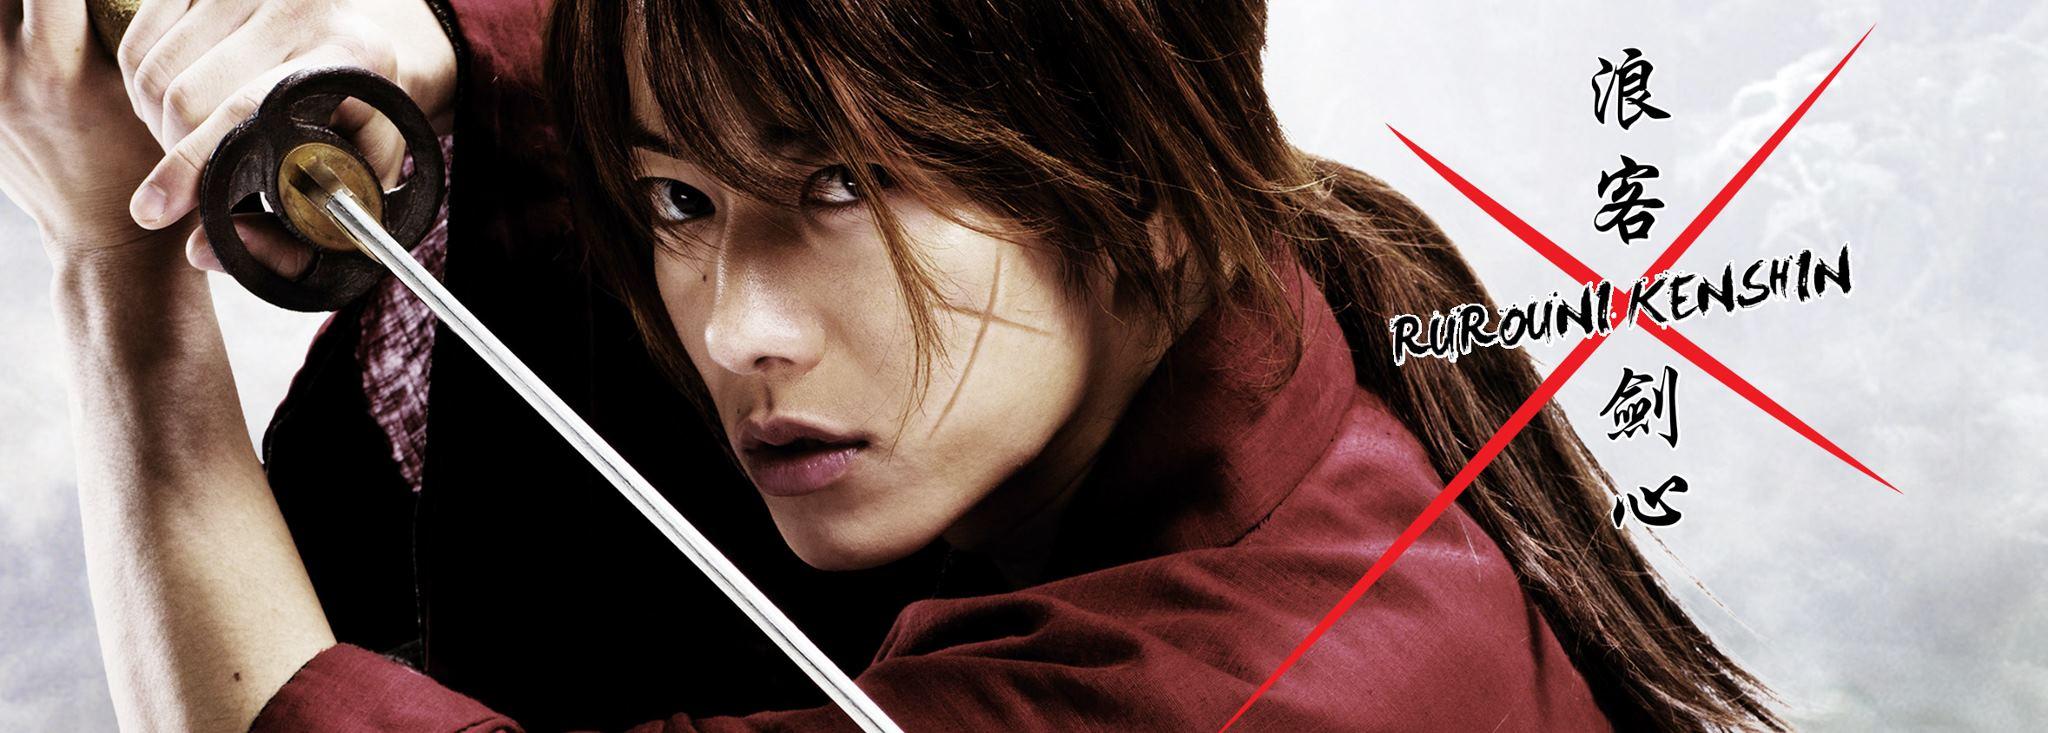 3rd-strike.com | Rurouni Kenshin (Meiji kenkaku roman tan ...